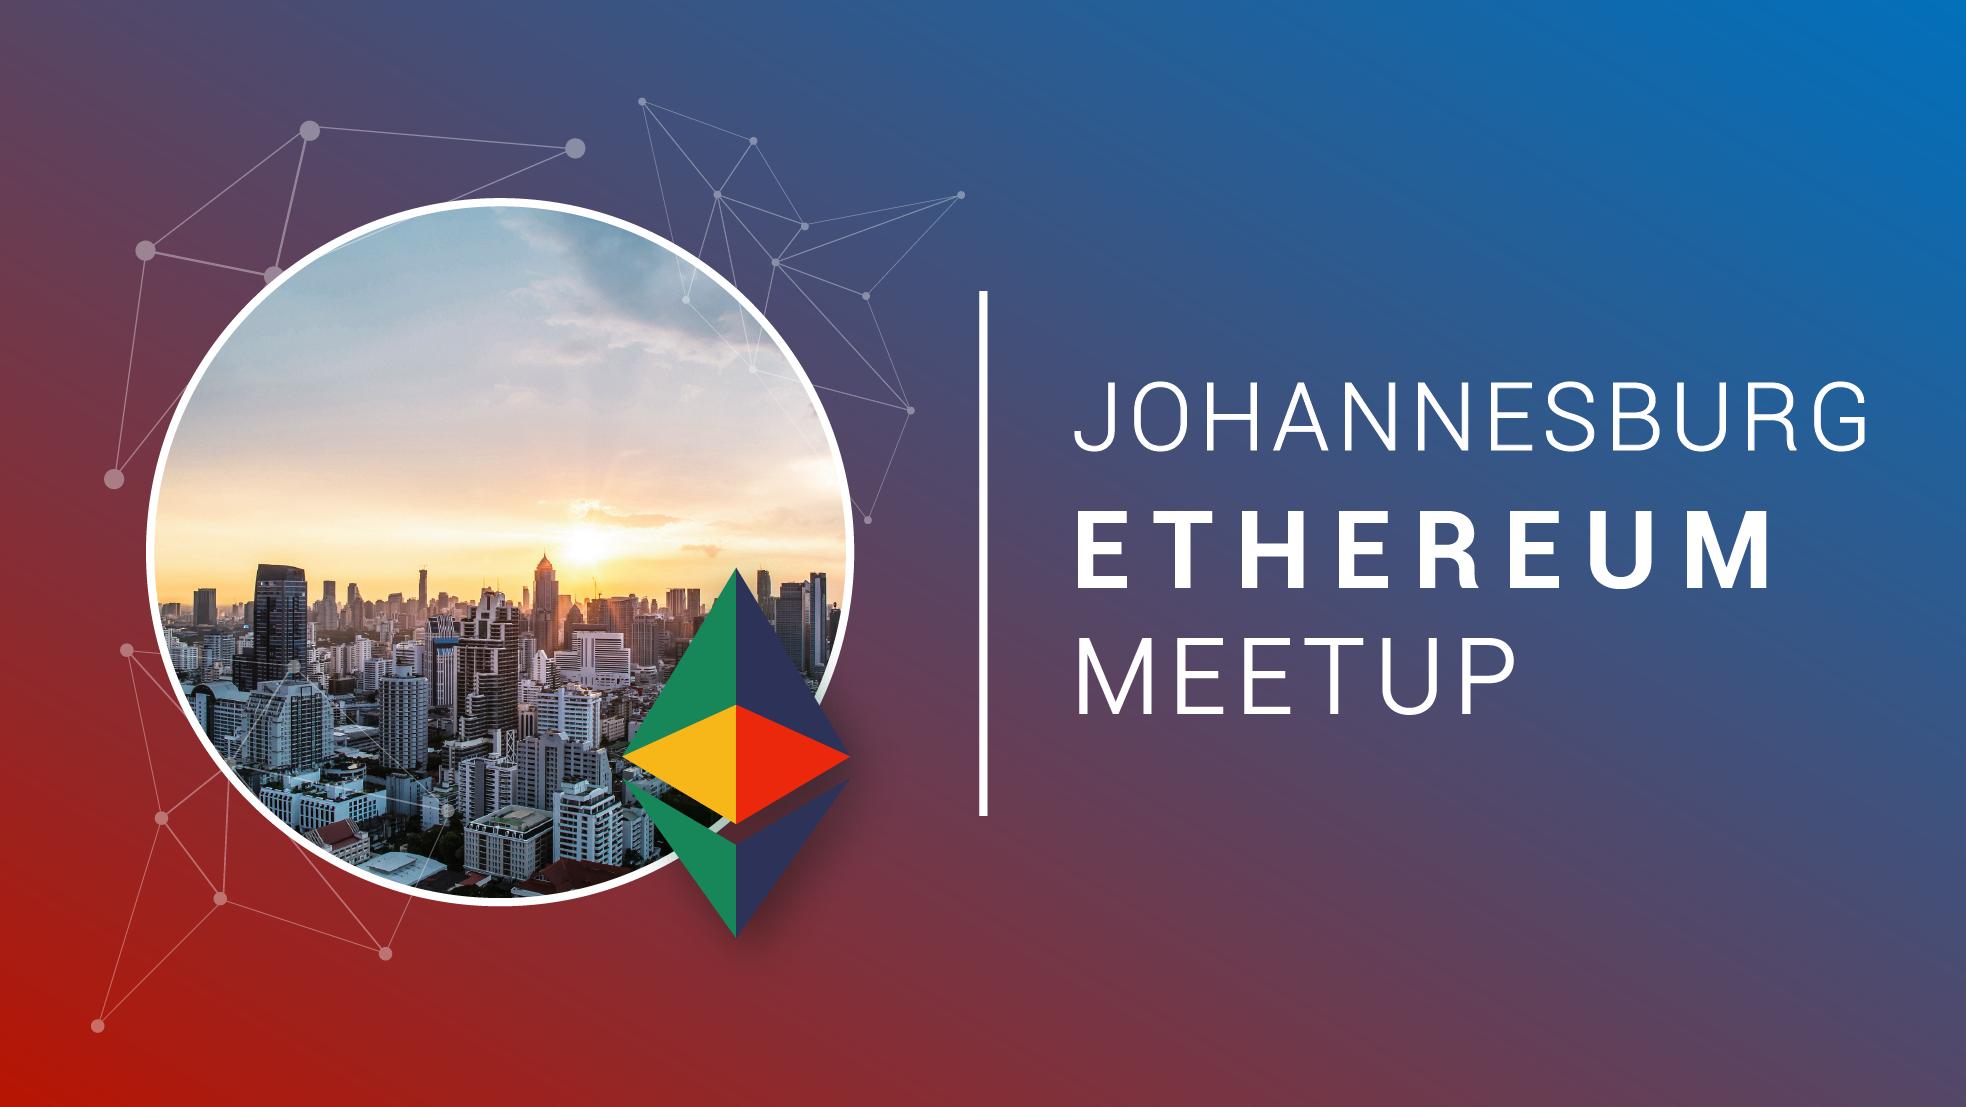 Johannesburg Ethereum Meetup